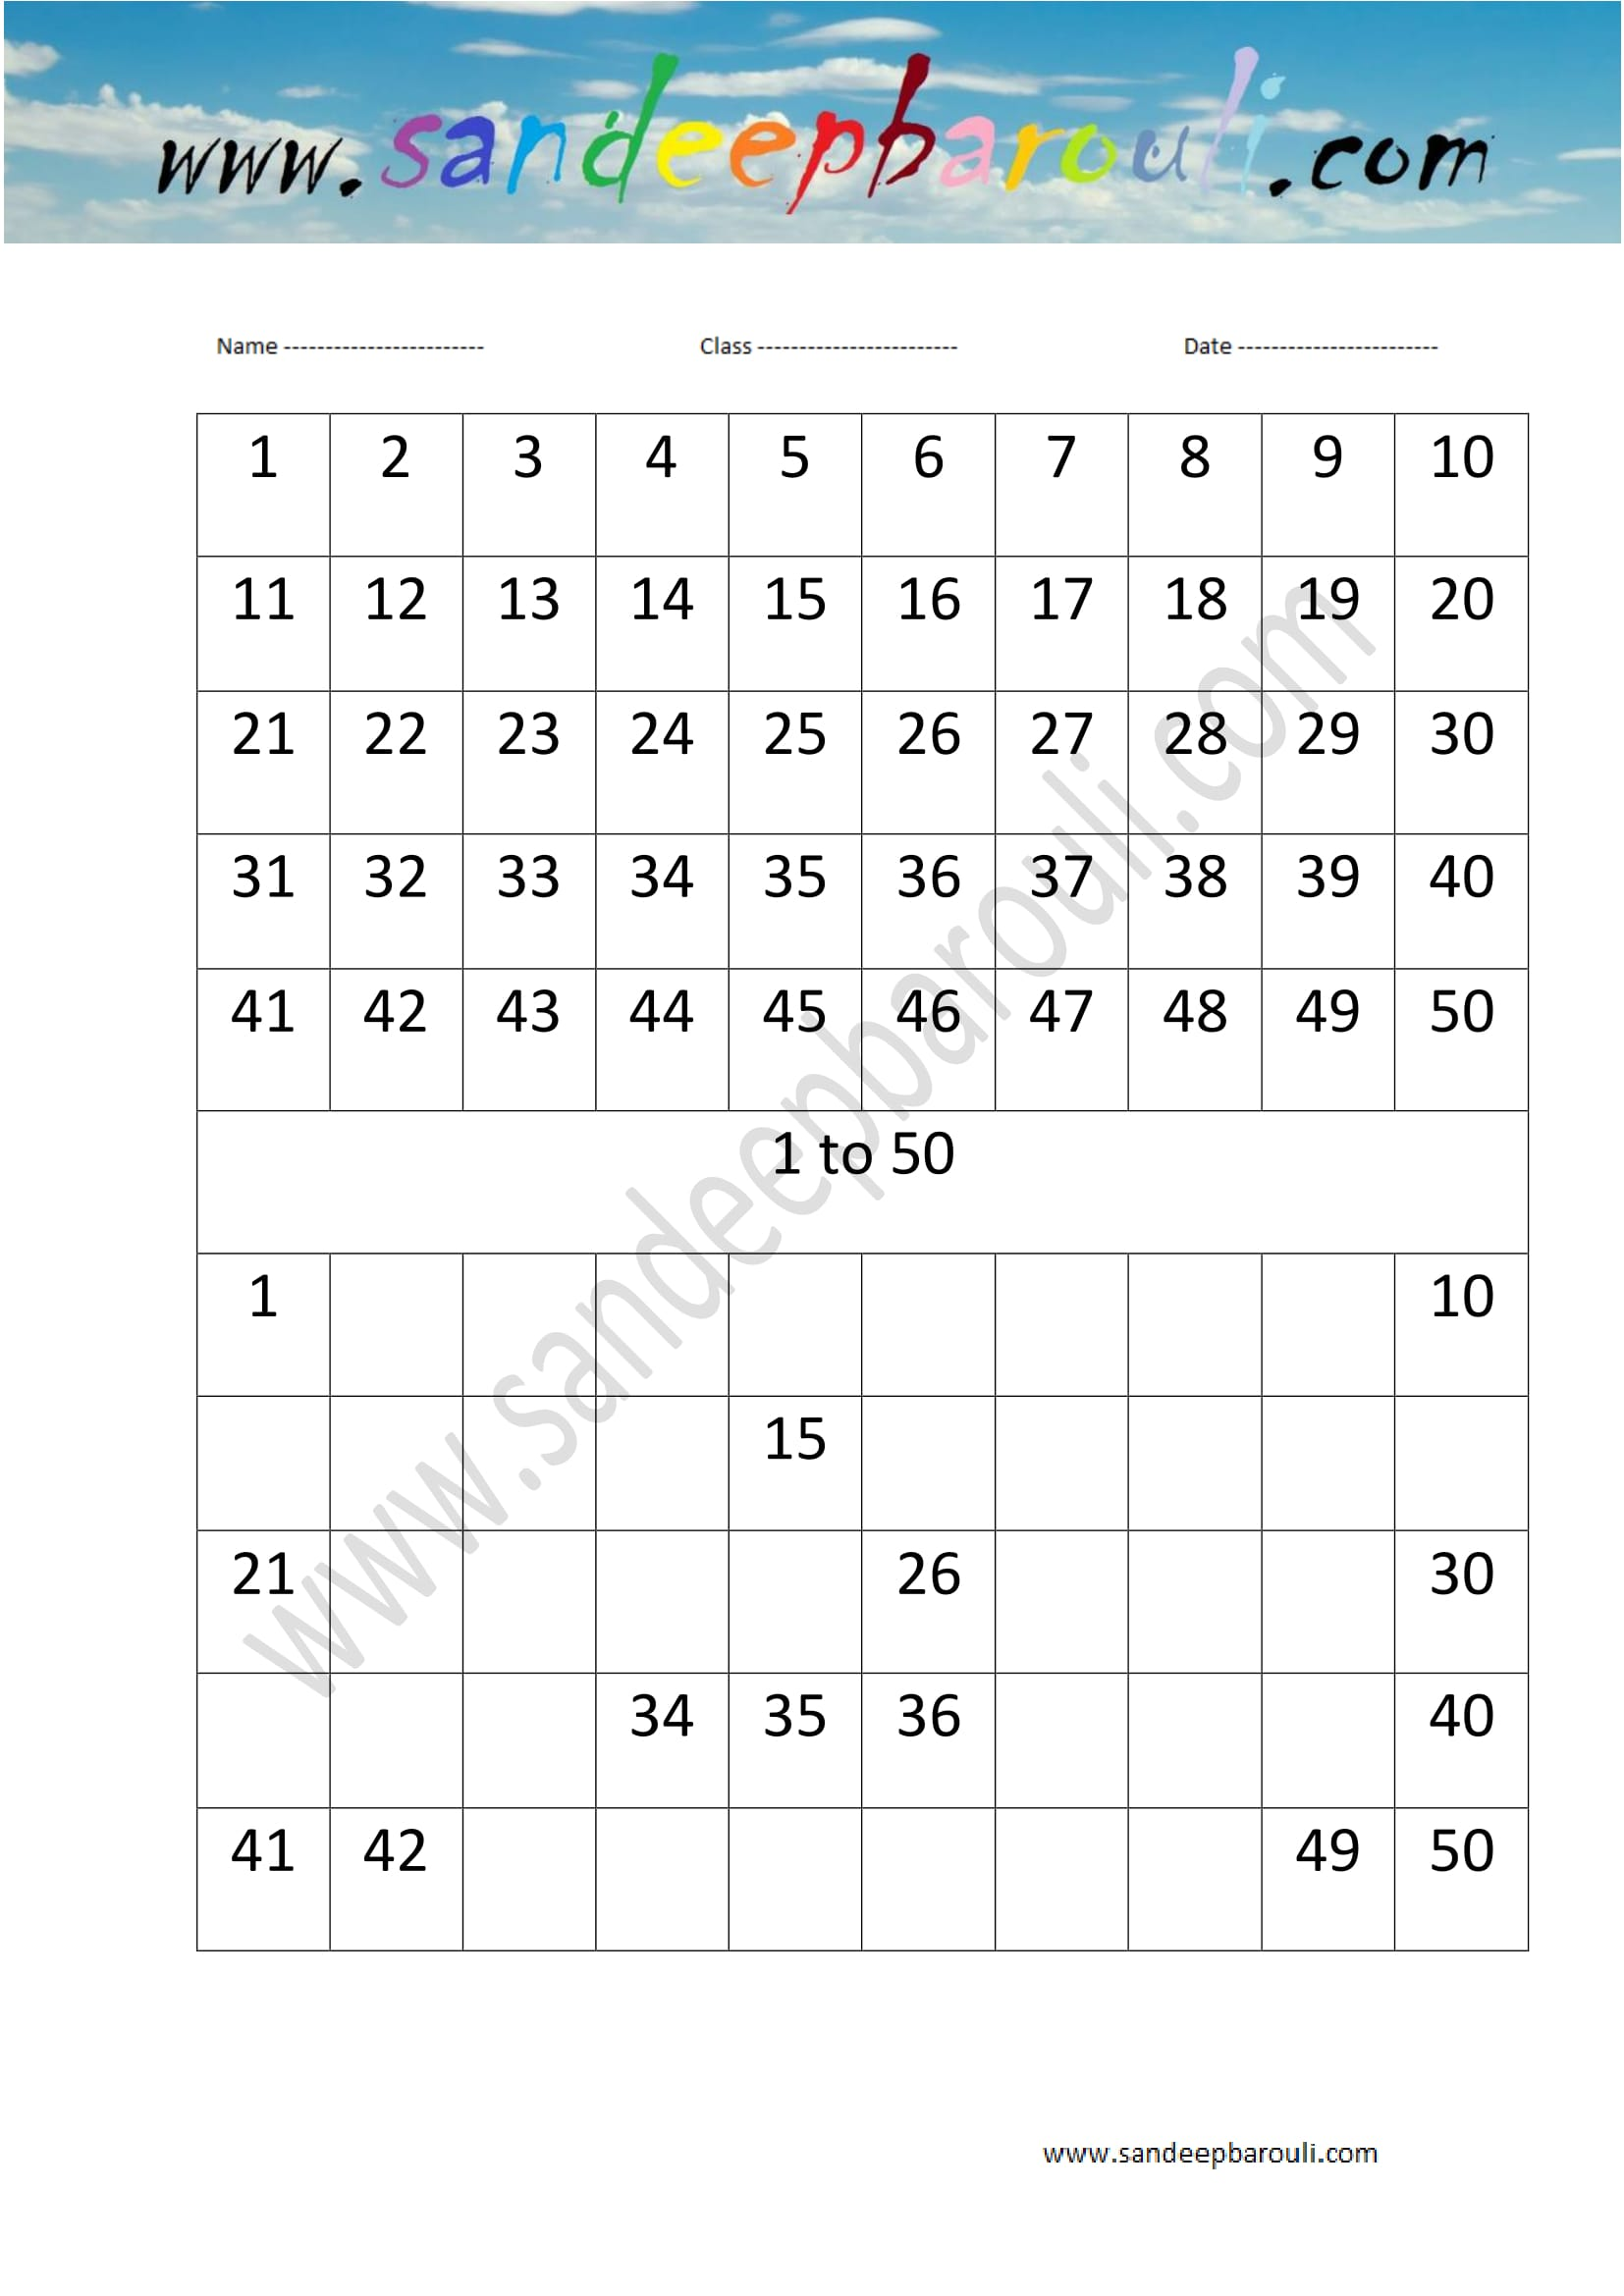 1 To 50 Counting Sandeepbarouli